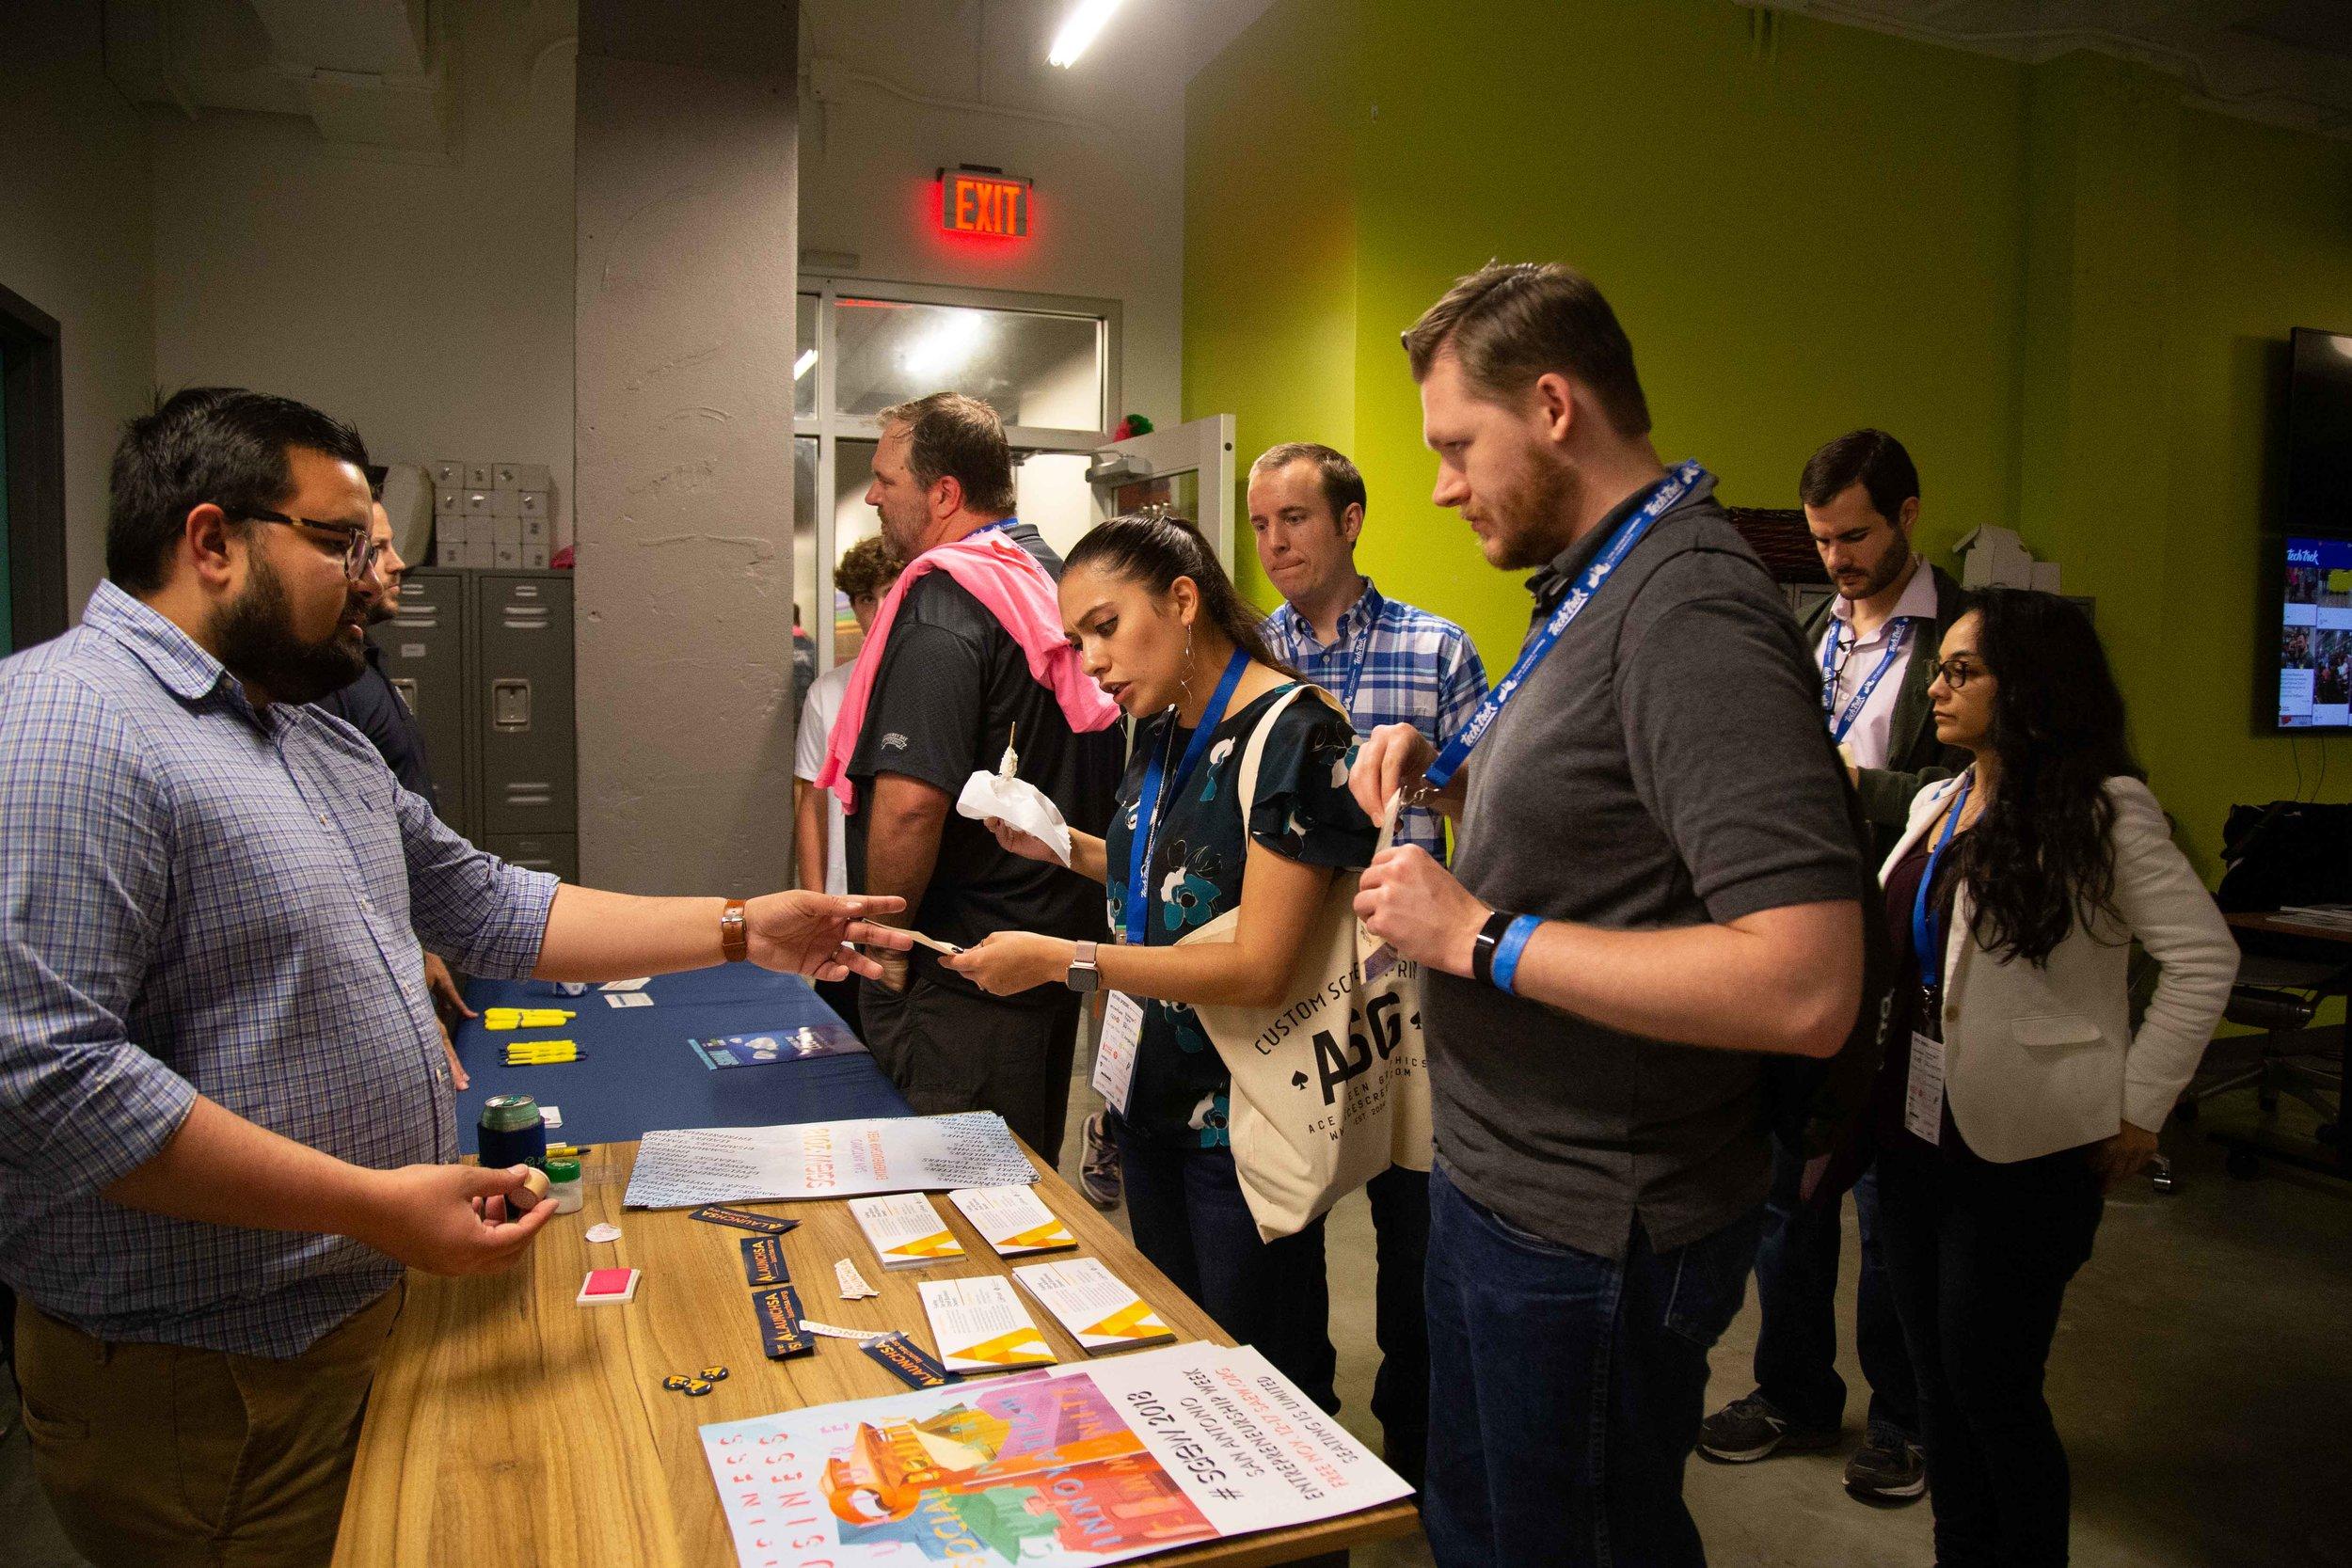 Ryan Salts talks to Tech Trek attendees. (Photo by  GA Media Productions .)